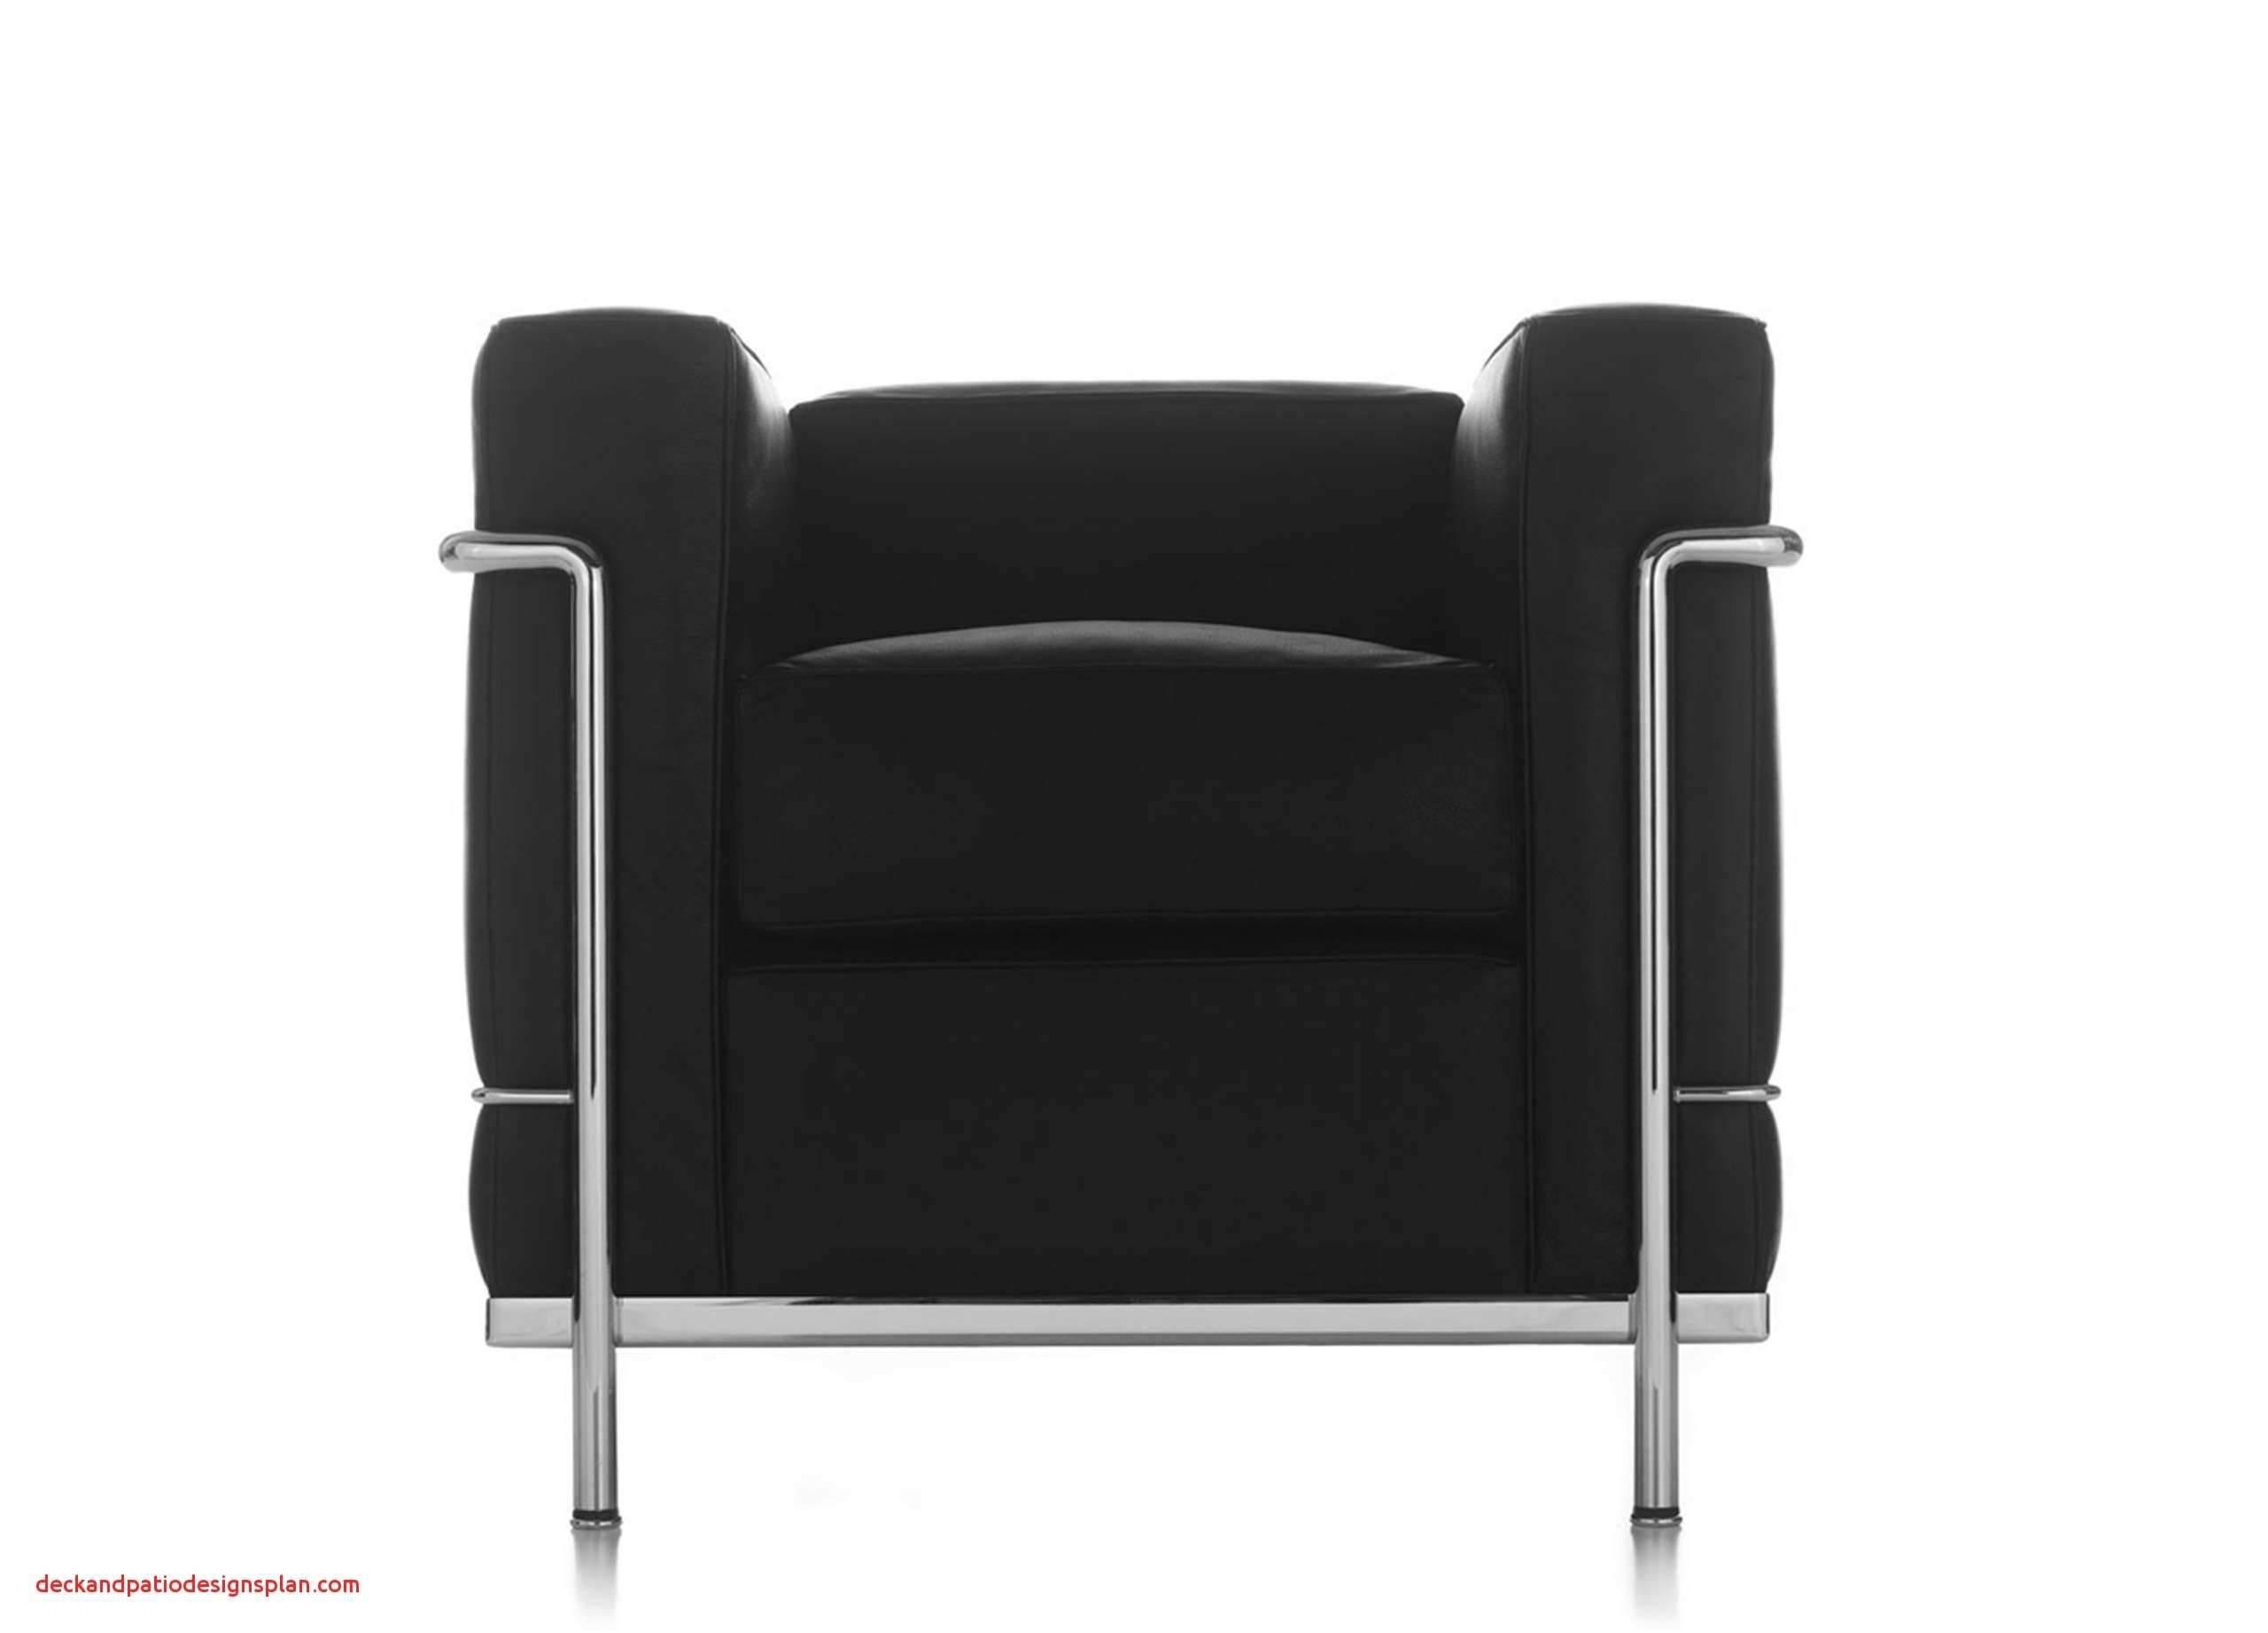 sofa mit sessel genial outdoor liege couch frisch 0d aufblasbares bilder sofa kxiztoup of sofa mit sessel